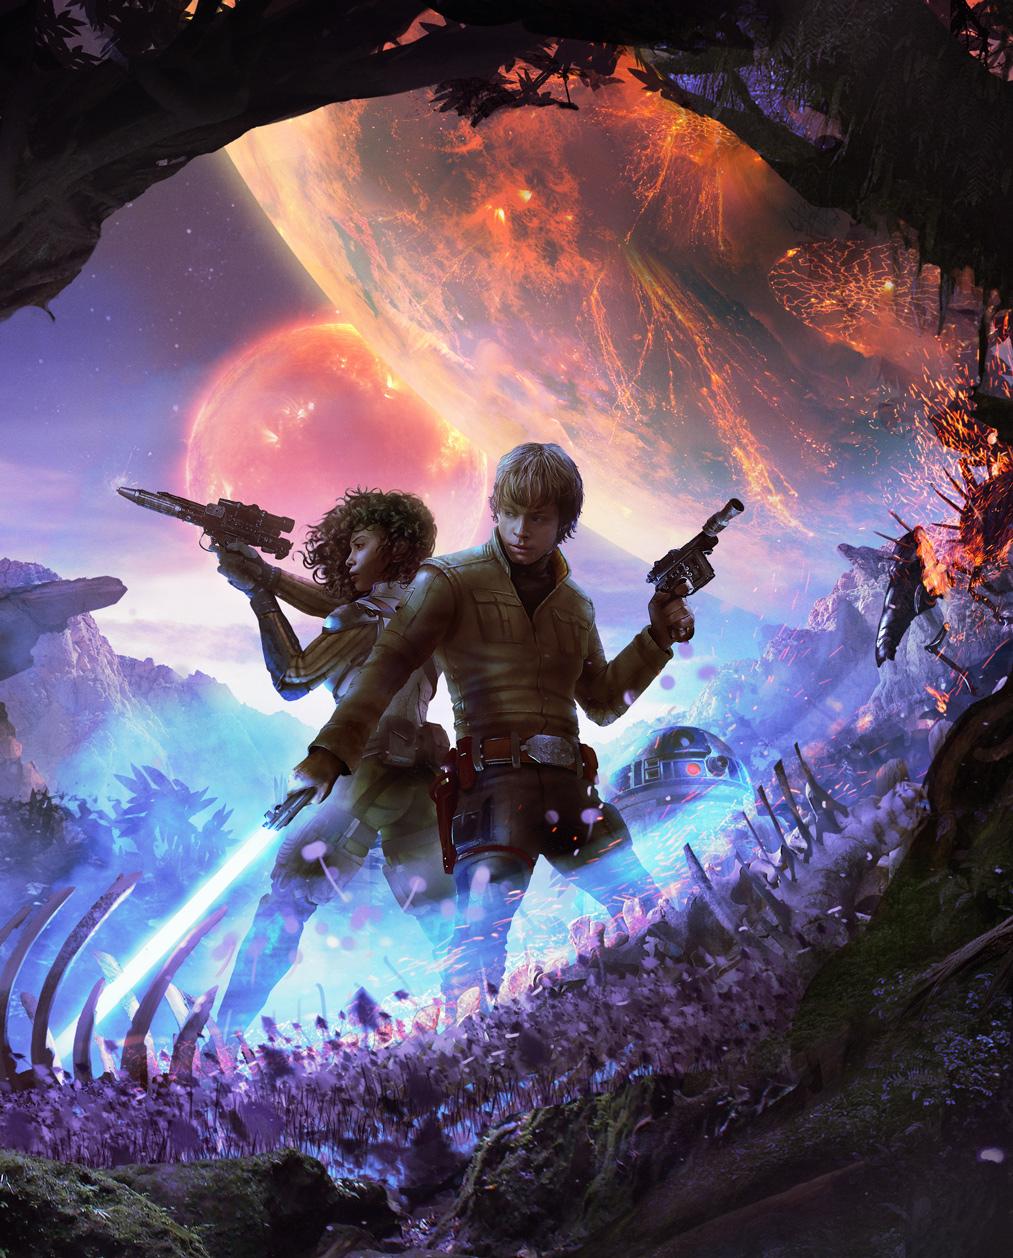 star wars Heir to the jedi book cover luke skywalker Nakari Kelen lucas Lucasfilm Editora Aleph